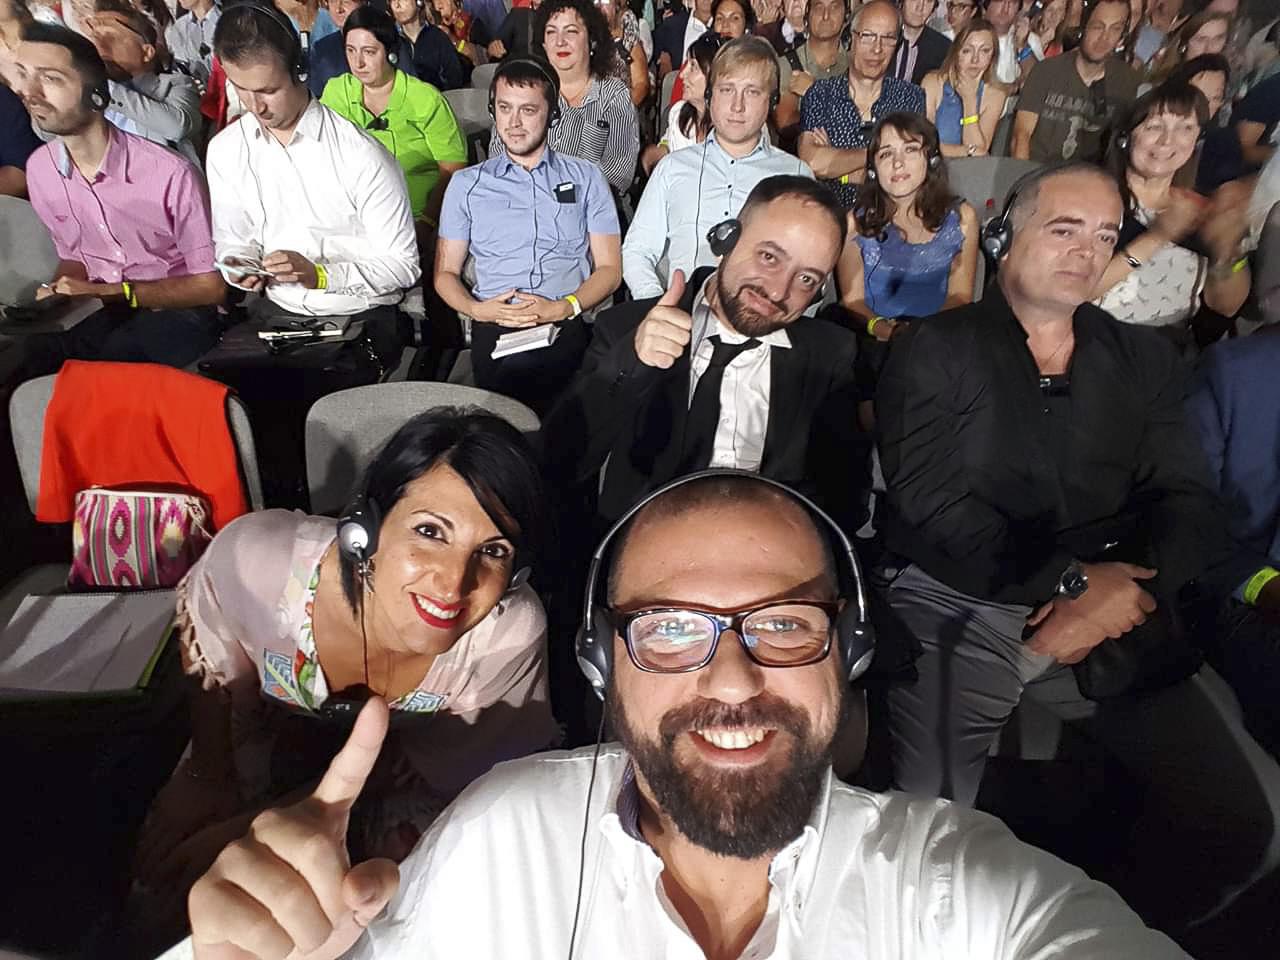 Duolife_Cavarra_Team_Corrado_Cavarra_Noto_Networker00018